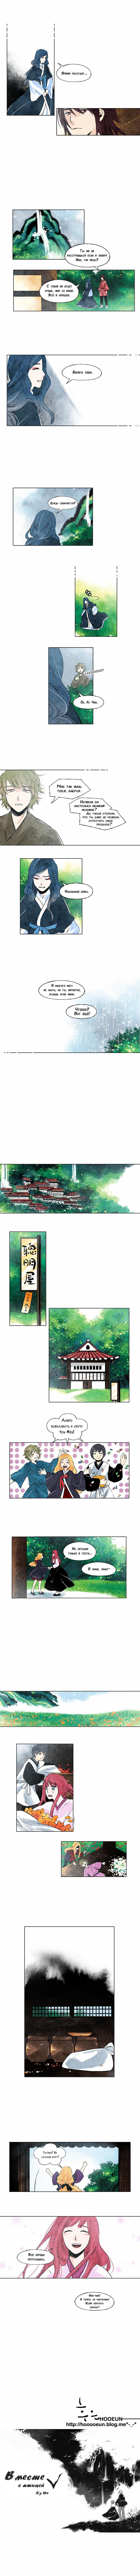 https://r1.ninemanga.com/comics/pic2/39/22503/1257043/1541334770238.jpg Page 3